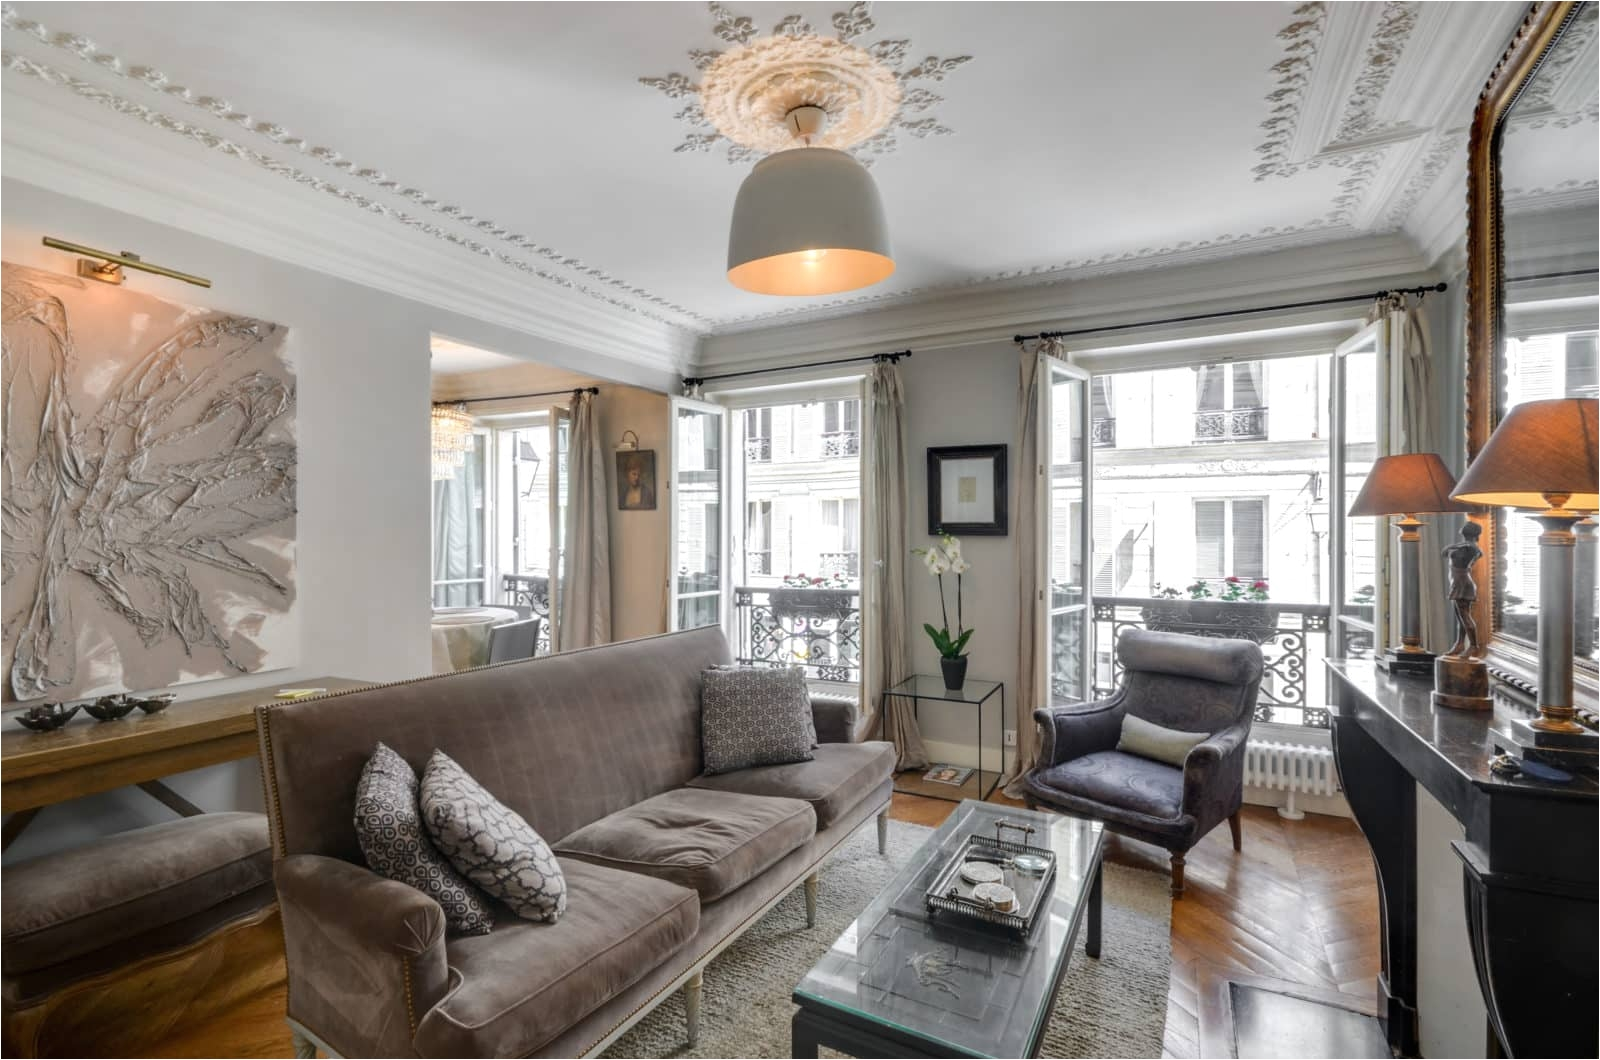 Paris France Homes for Sale Rue Malher Fractional Ownership Property Paris Property Group